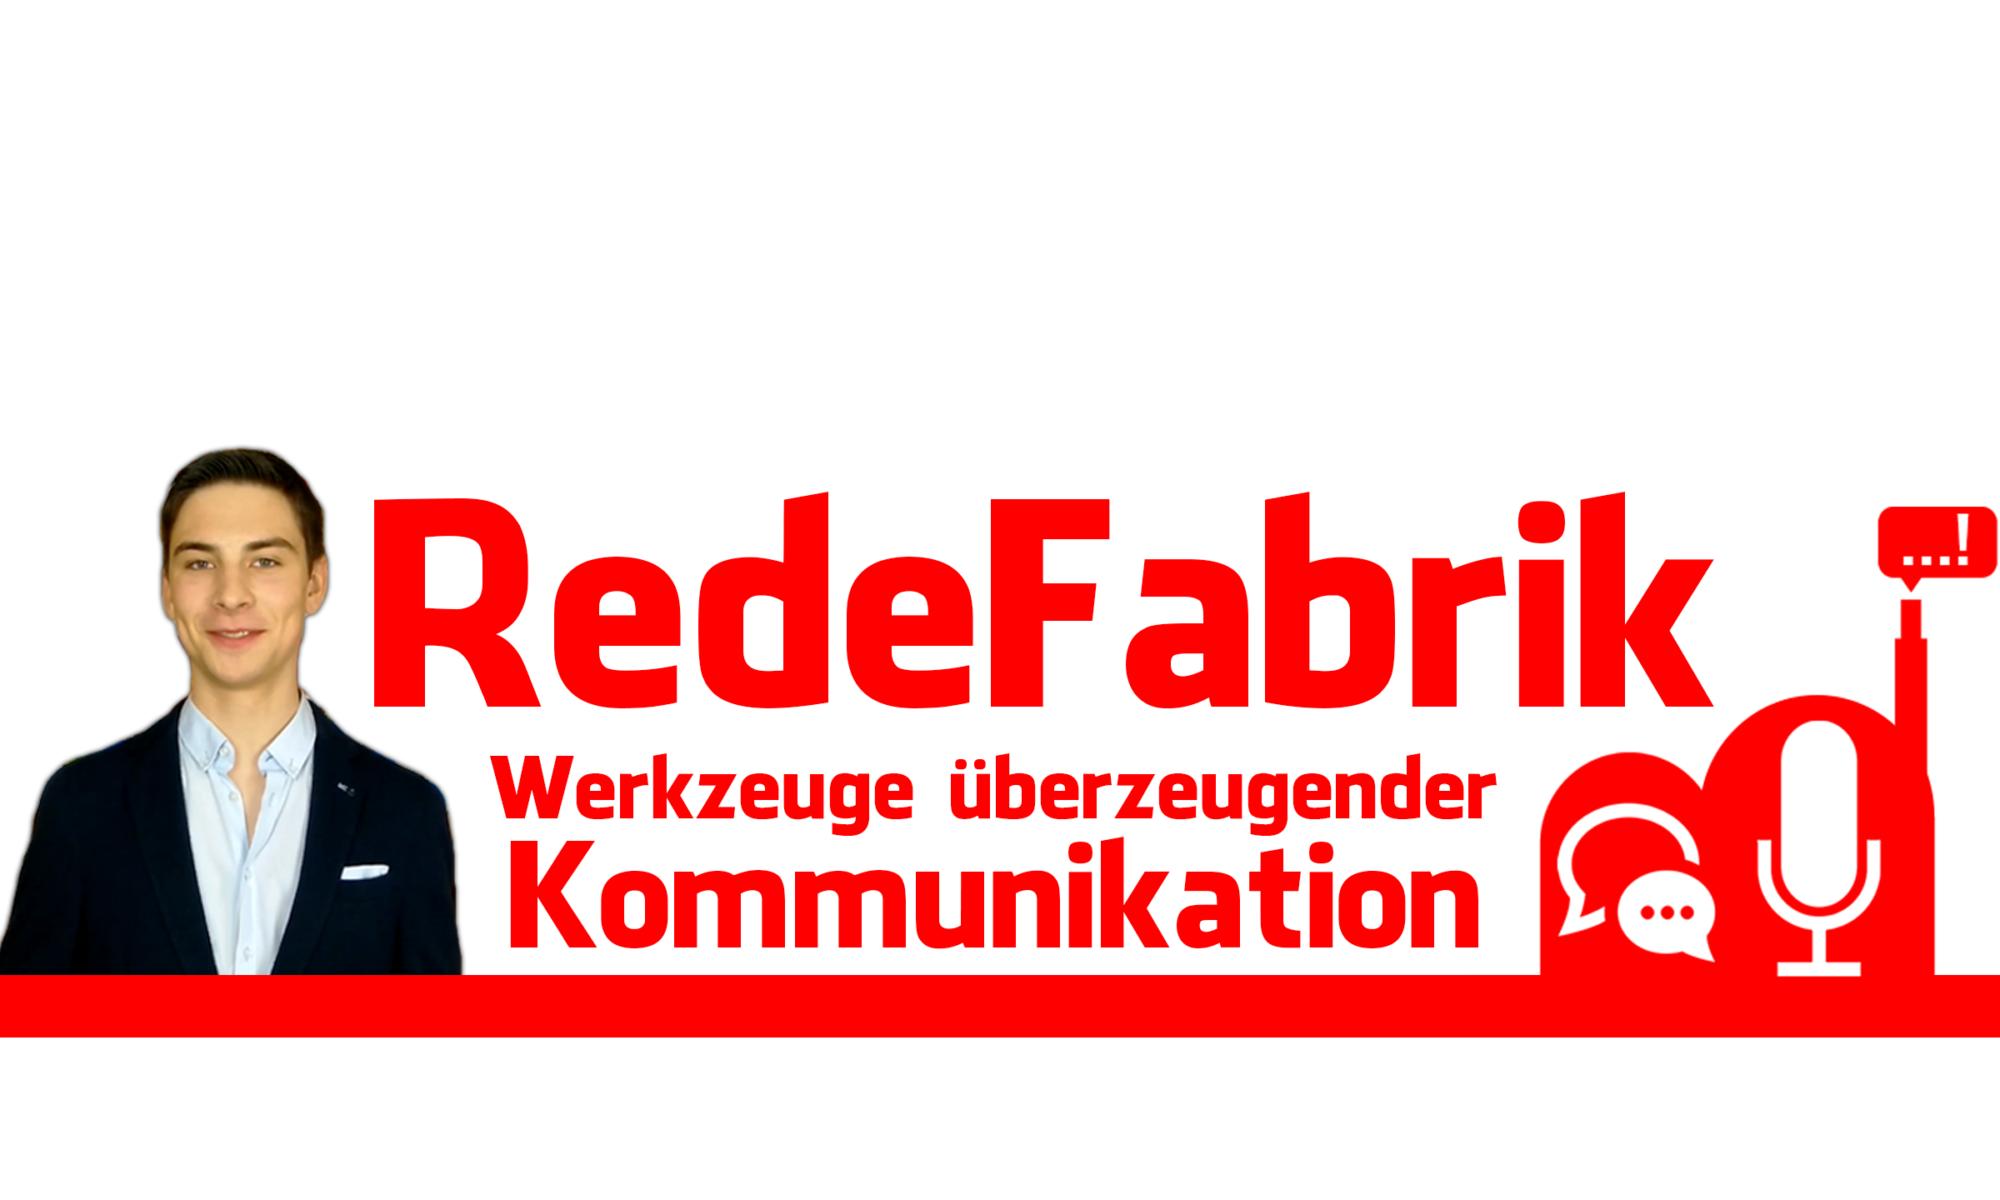 redefabrik.net